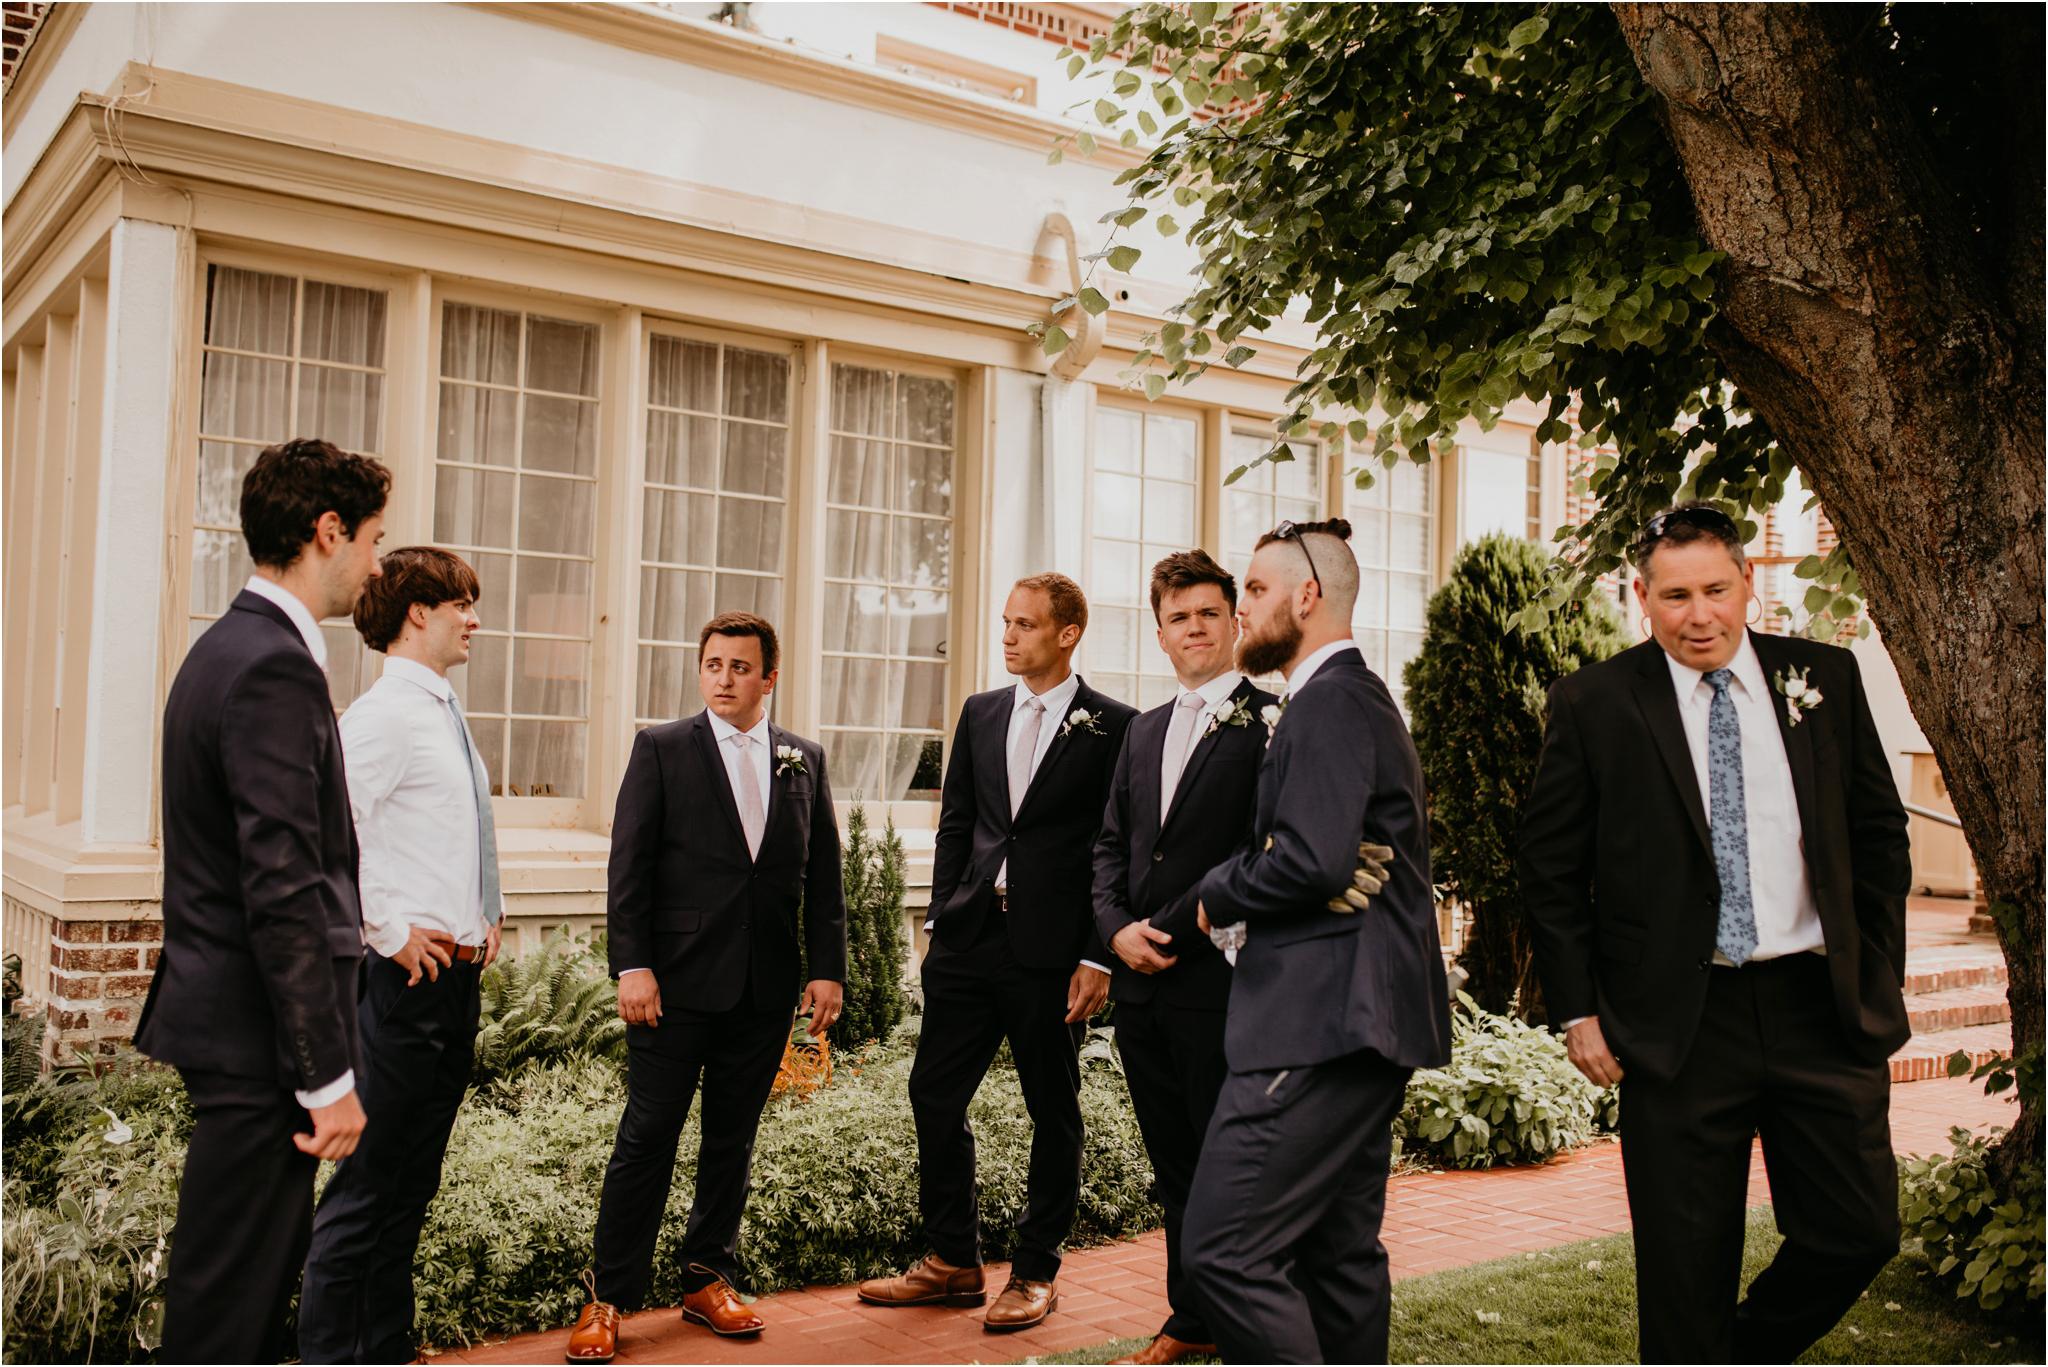 chance-and-ondrea-lairmont-manor-wedding-seattle-photographer-023.jpg